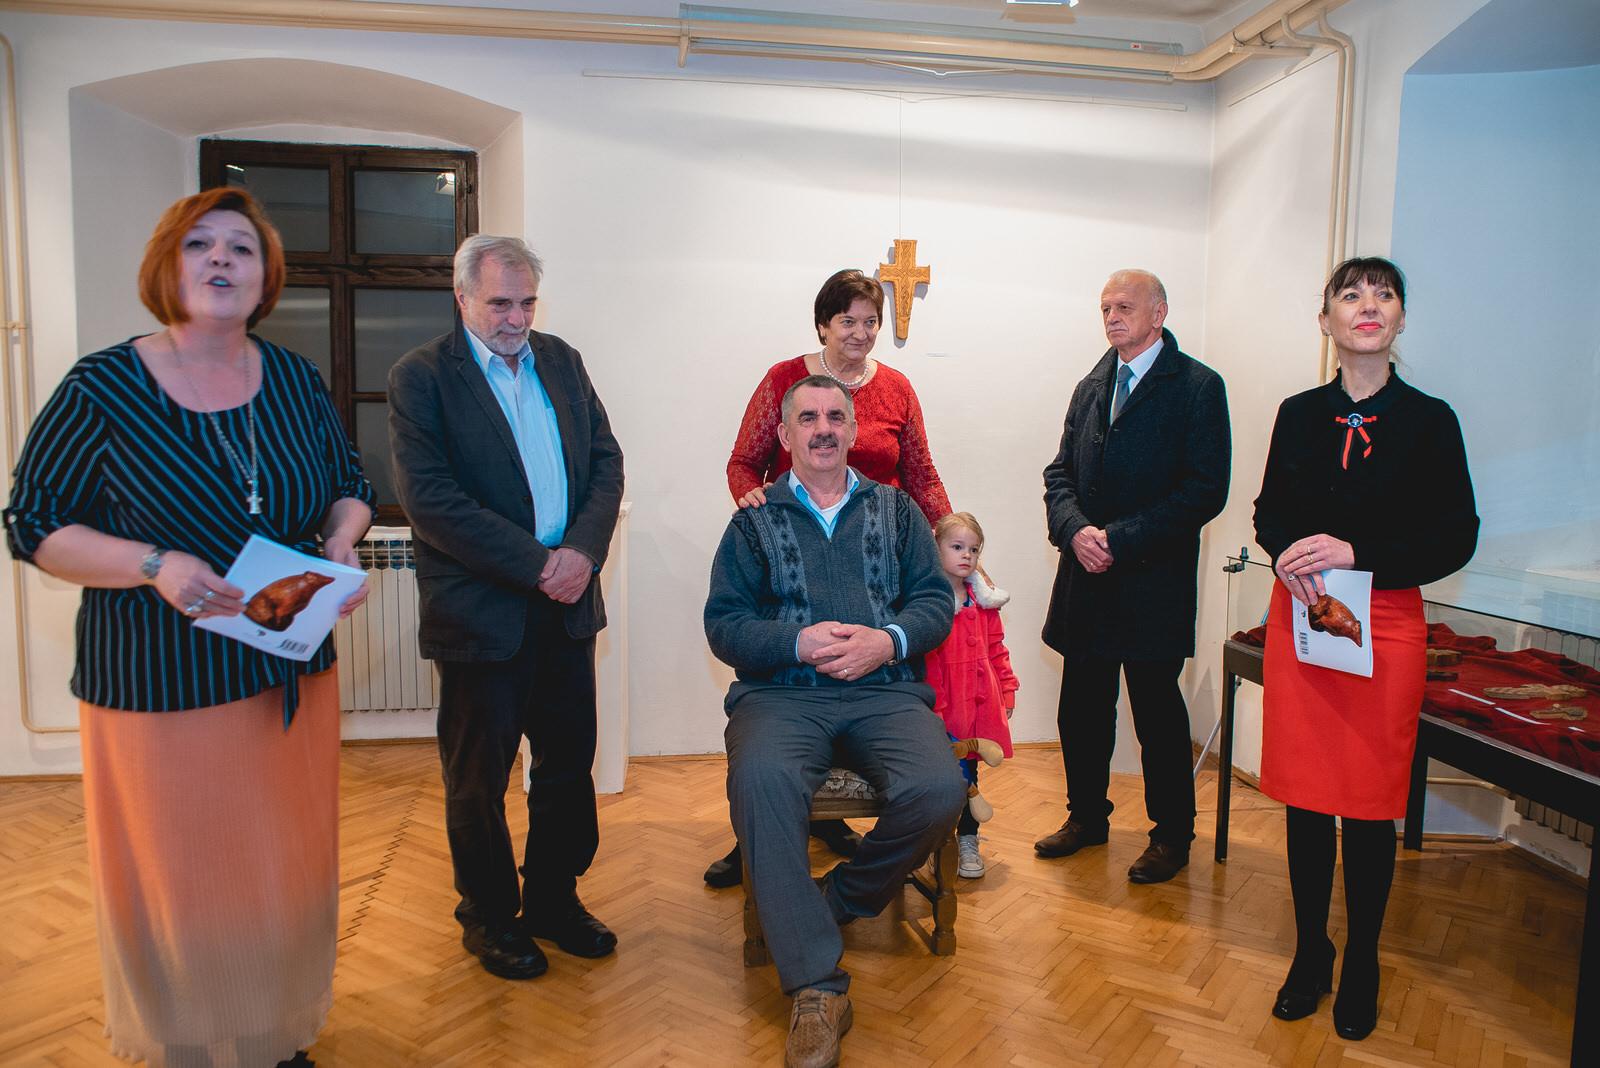 likaclub_gospić_izložba-poetika-skulpture-u-drvu_2019-91